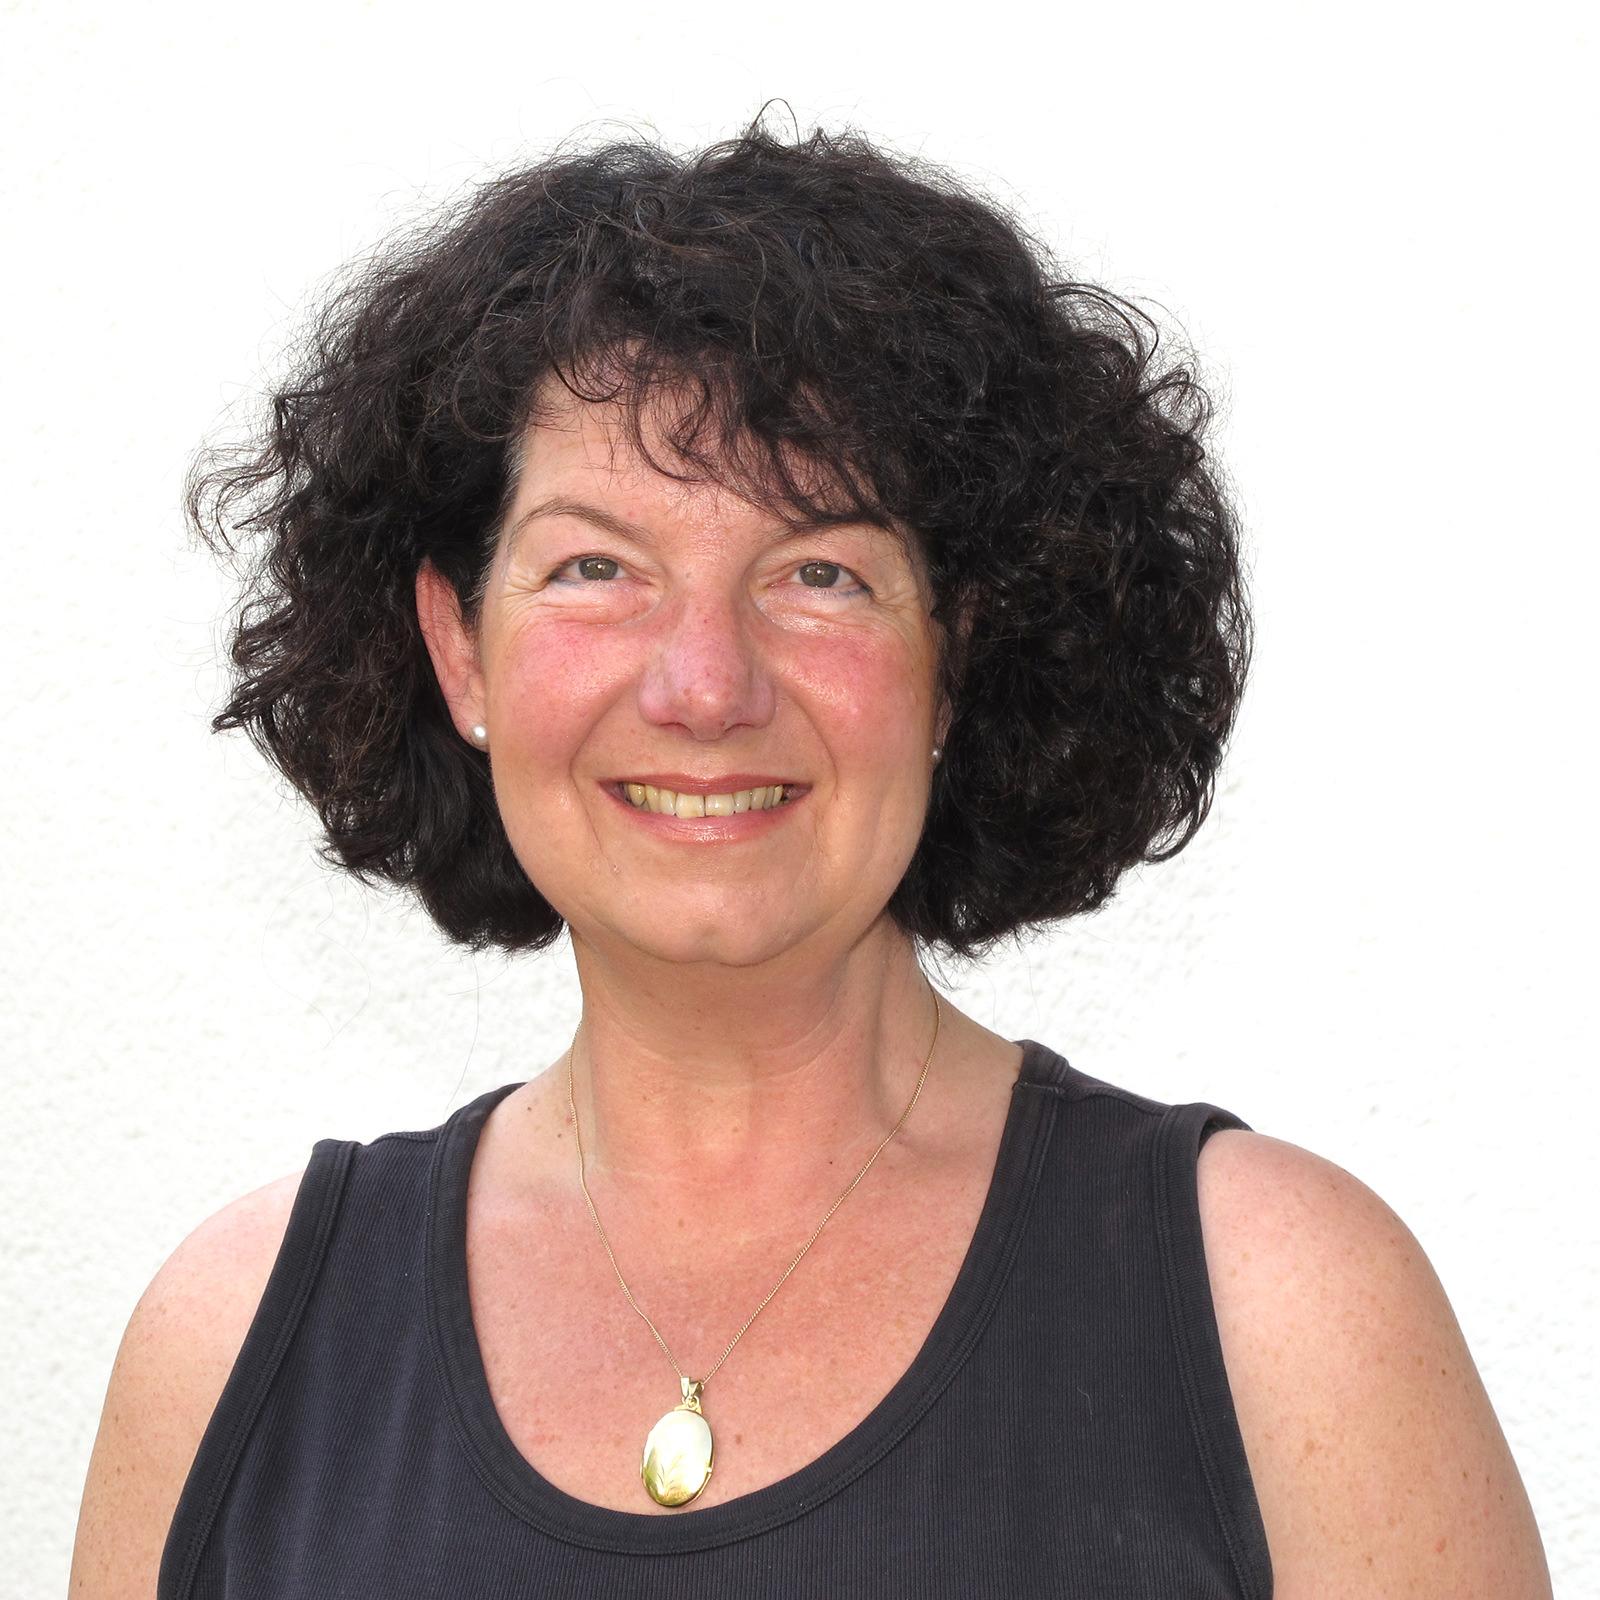 Anette Scharla-Dey